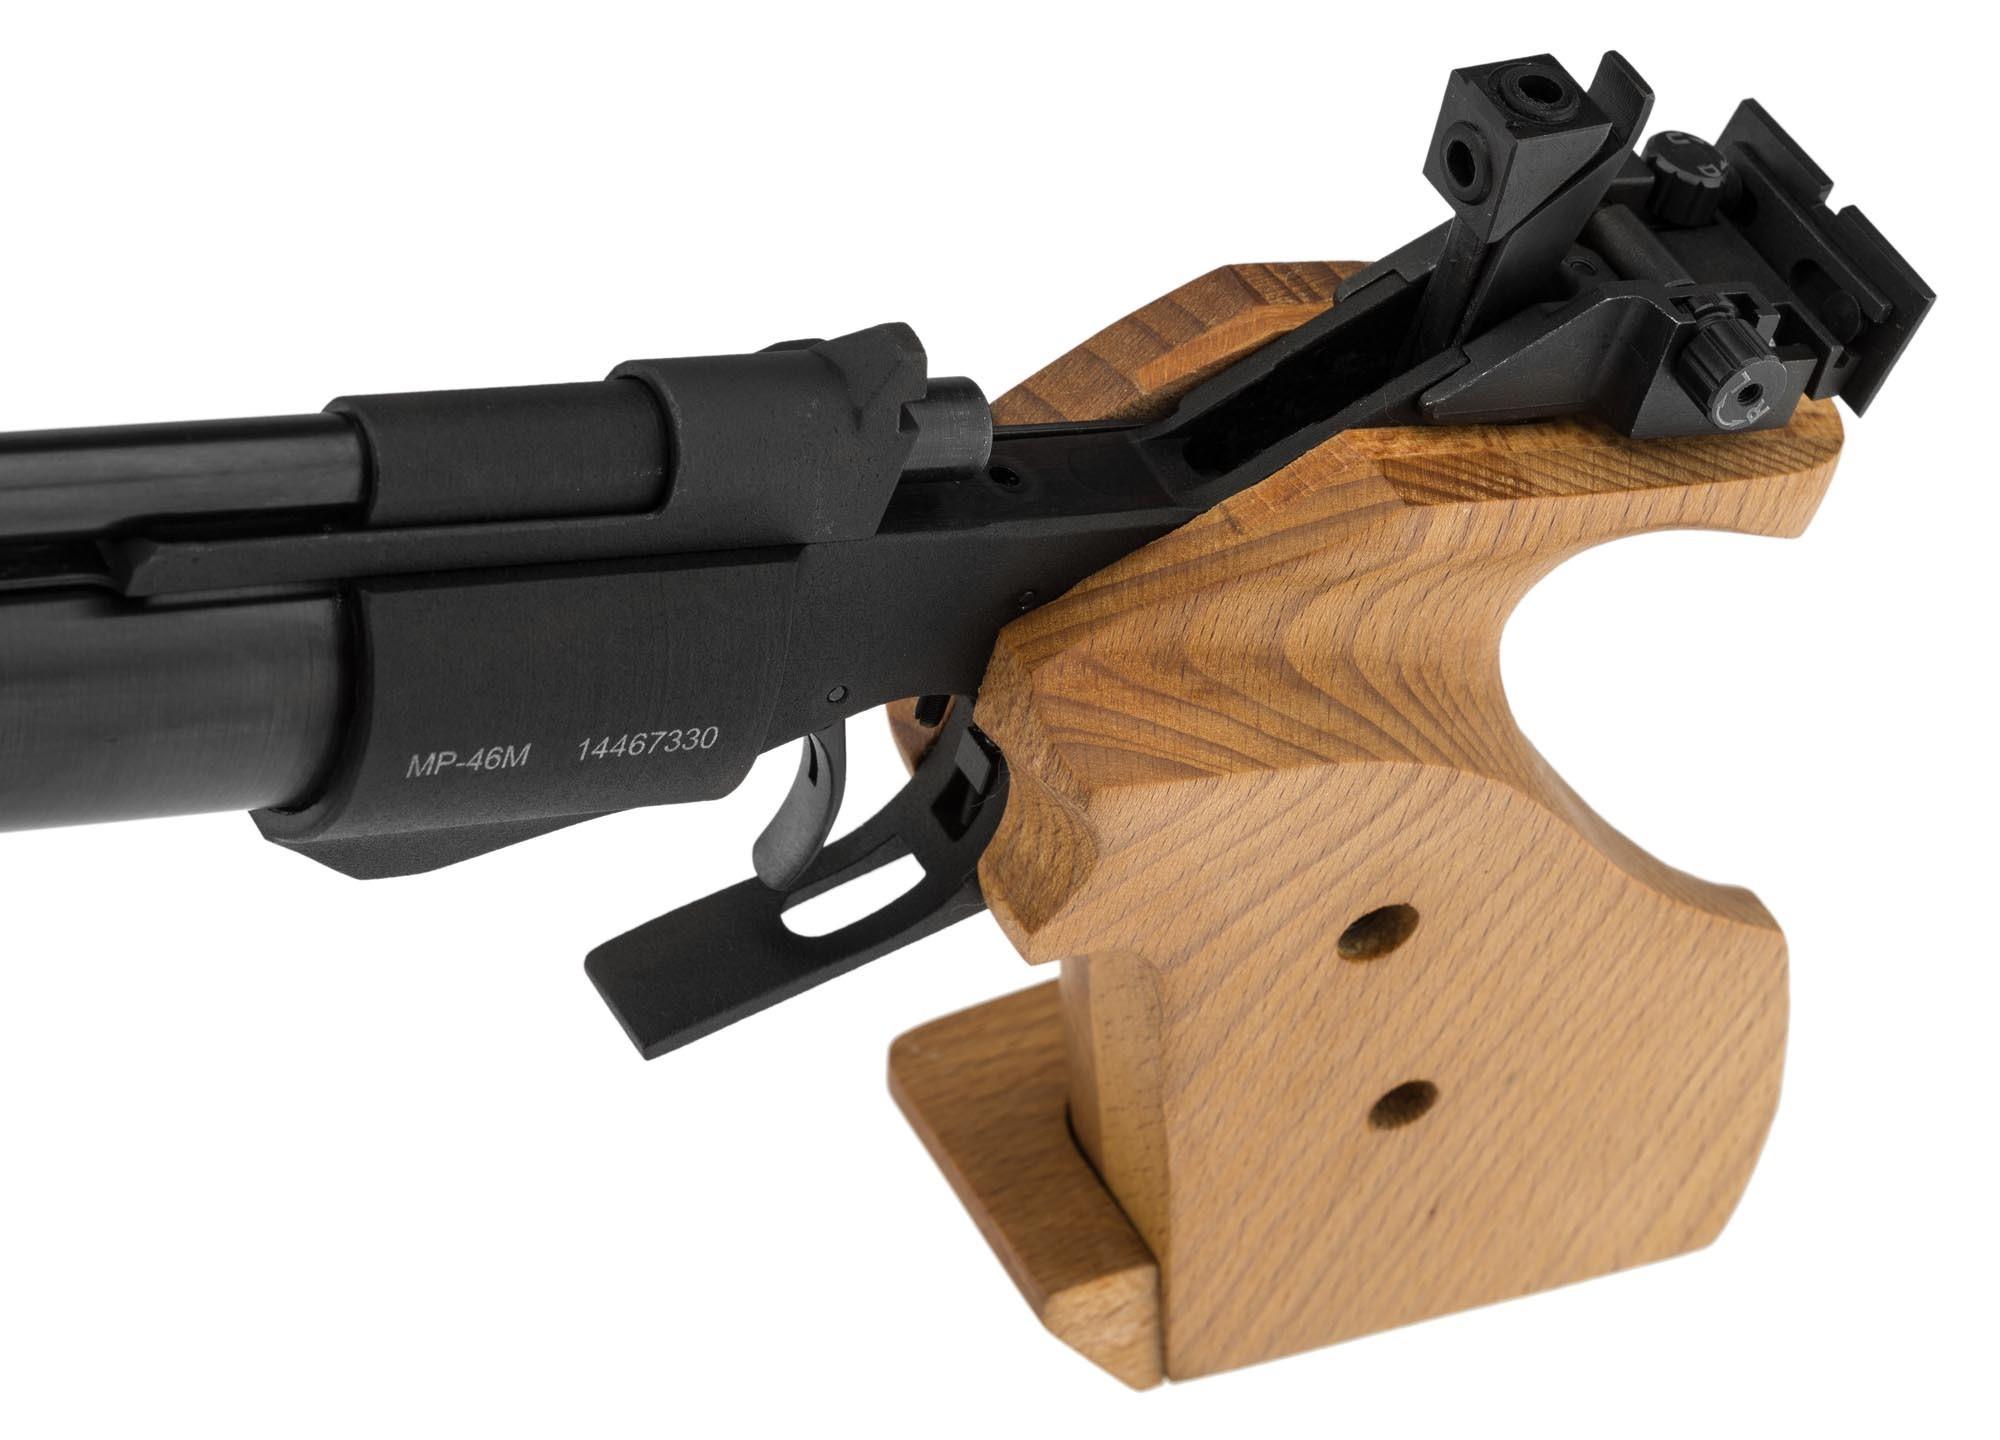 pistolet air comprim ba kal match mp 46m cal 4 5 mm pistolets air comprim co2 made. Black Bedroom Furniture Sets. Home Design Ideas